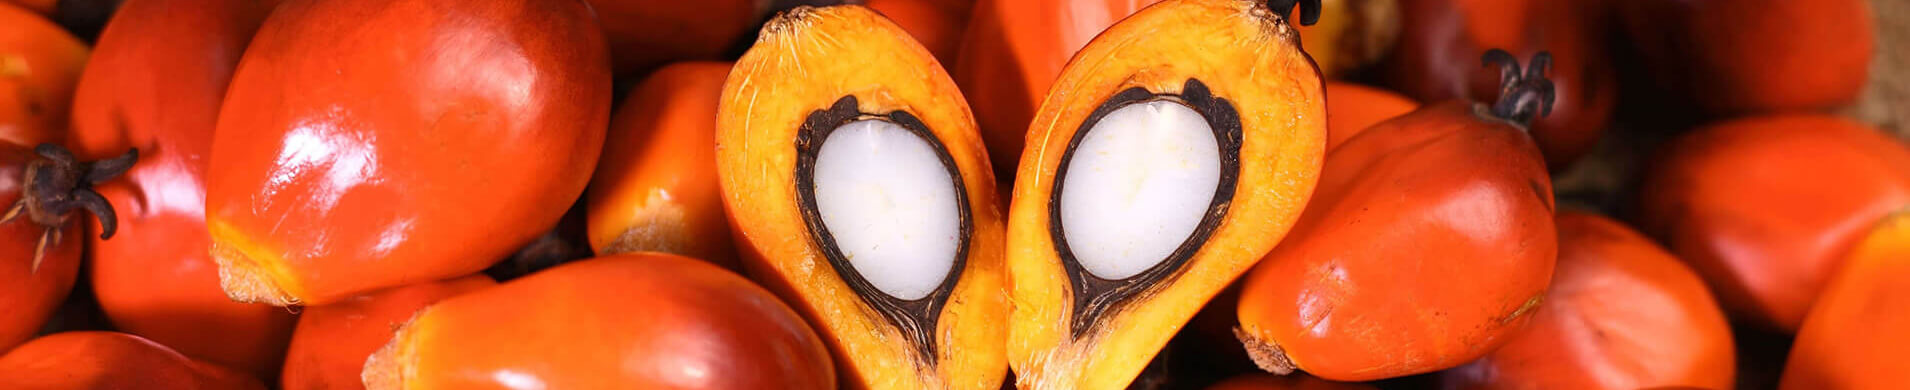 Palm kernel fatty acid